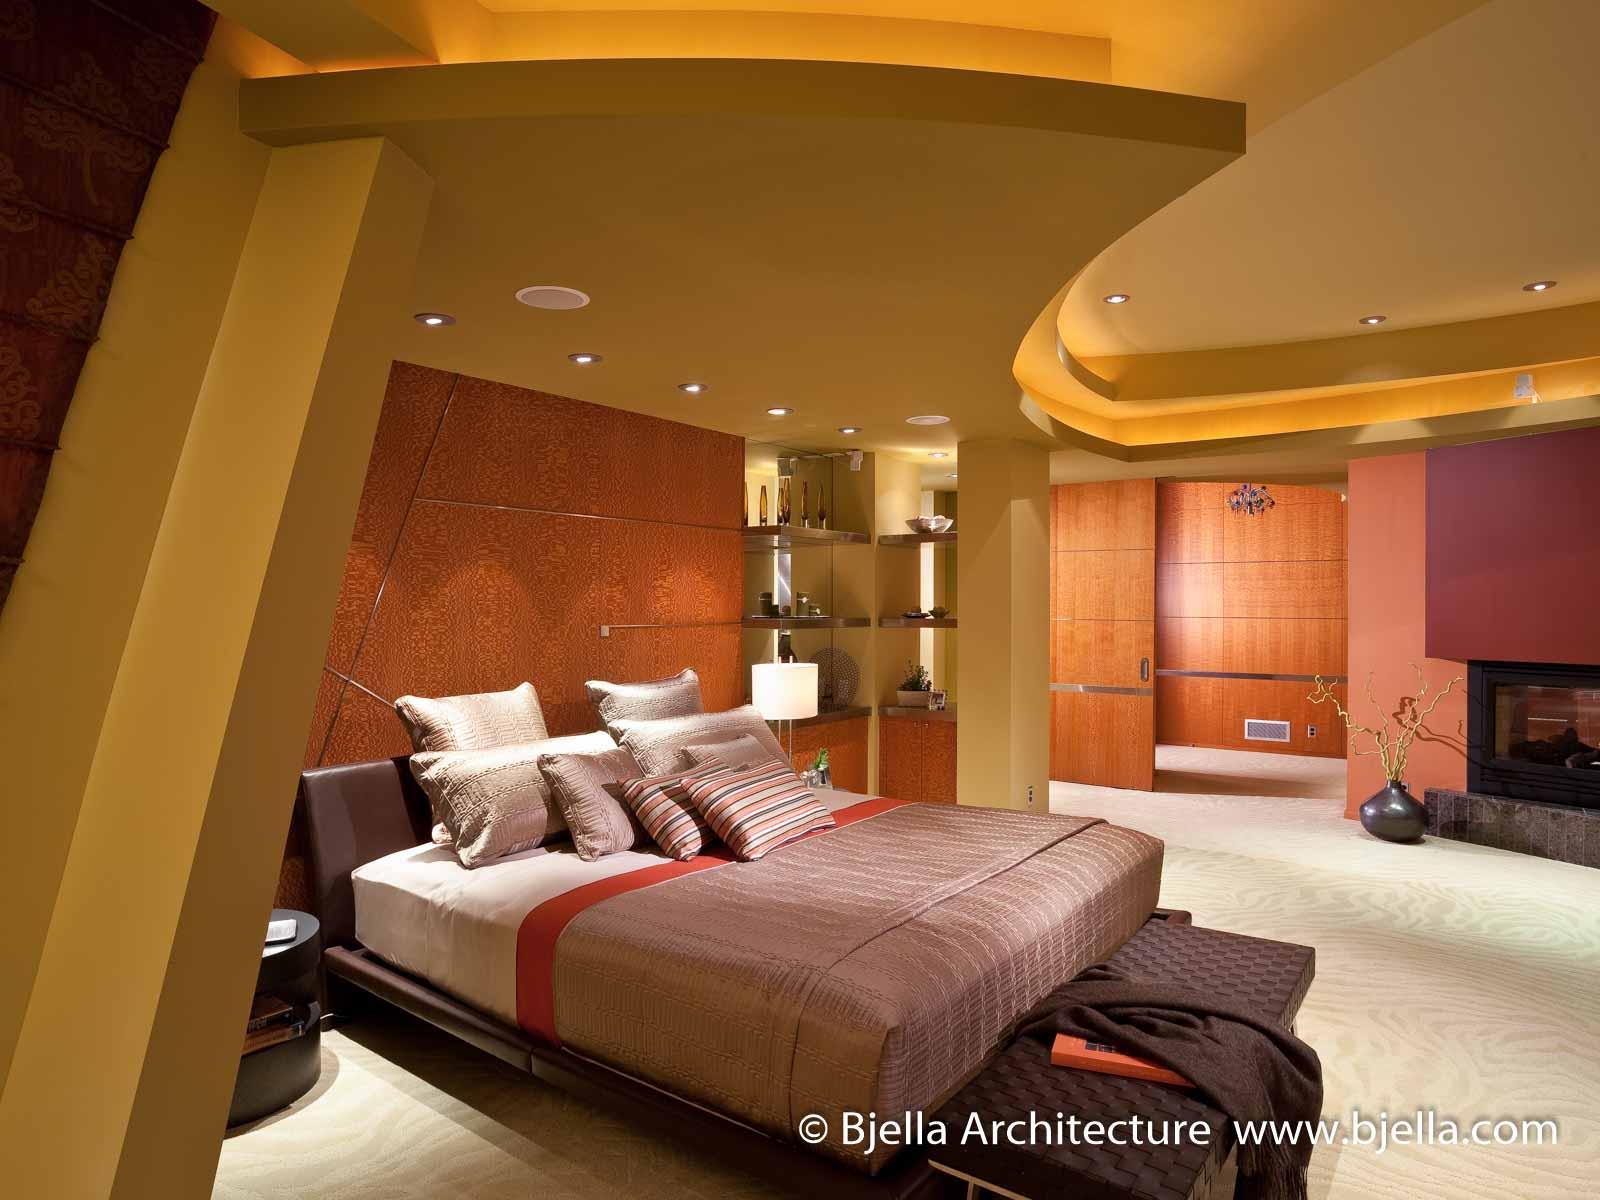 Bjella Architecture - Modern Bedroom Design-1